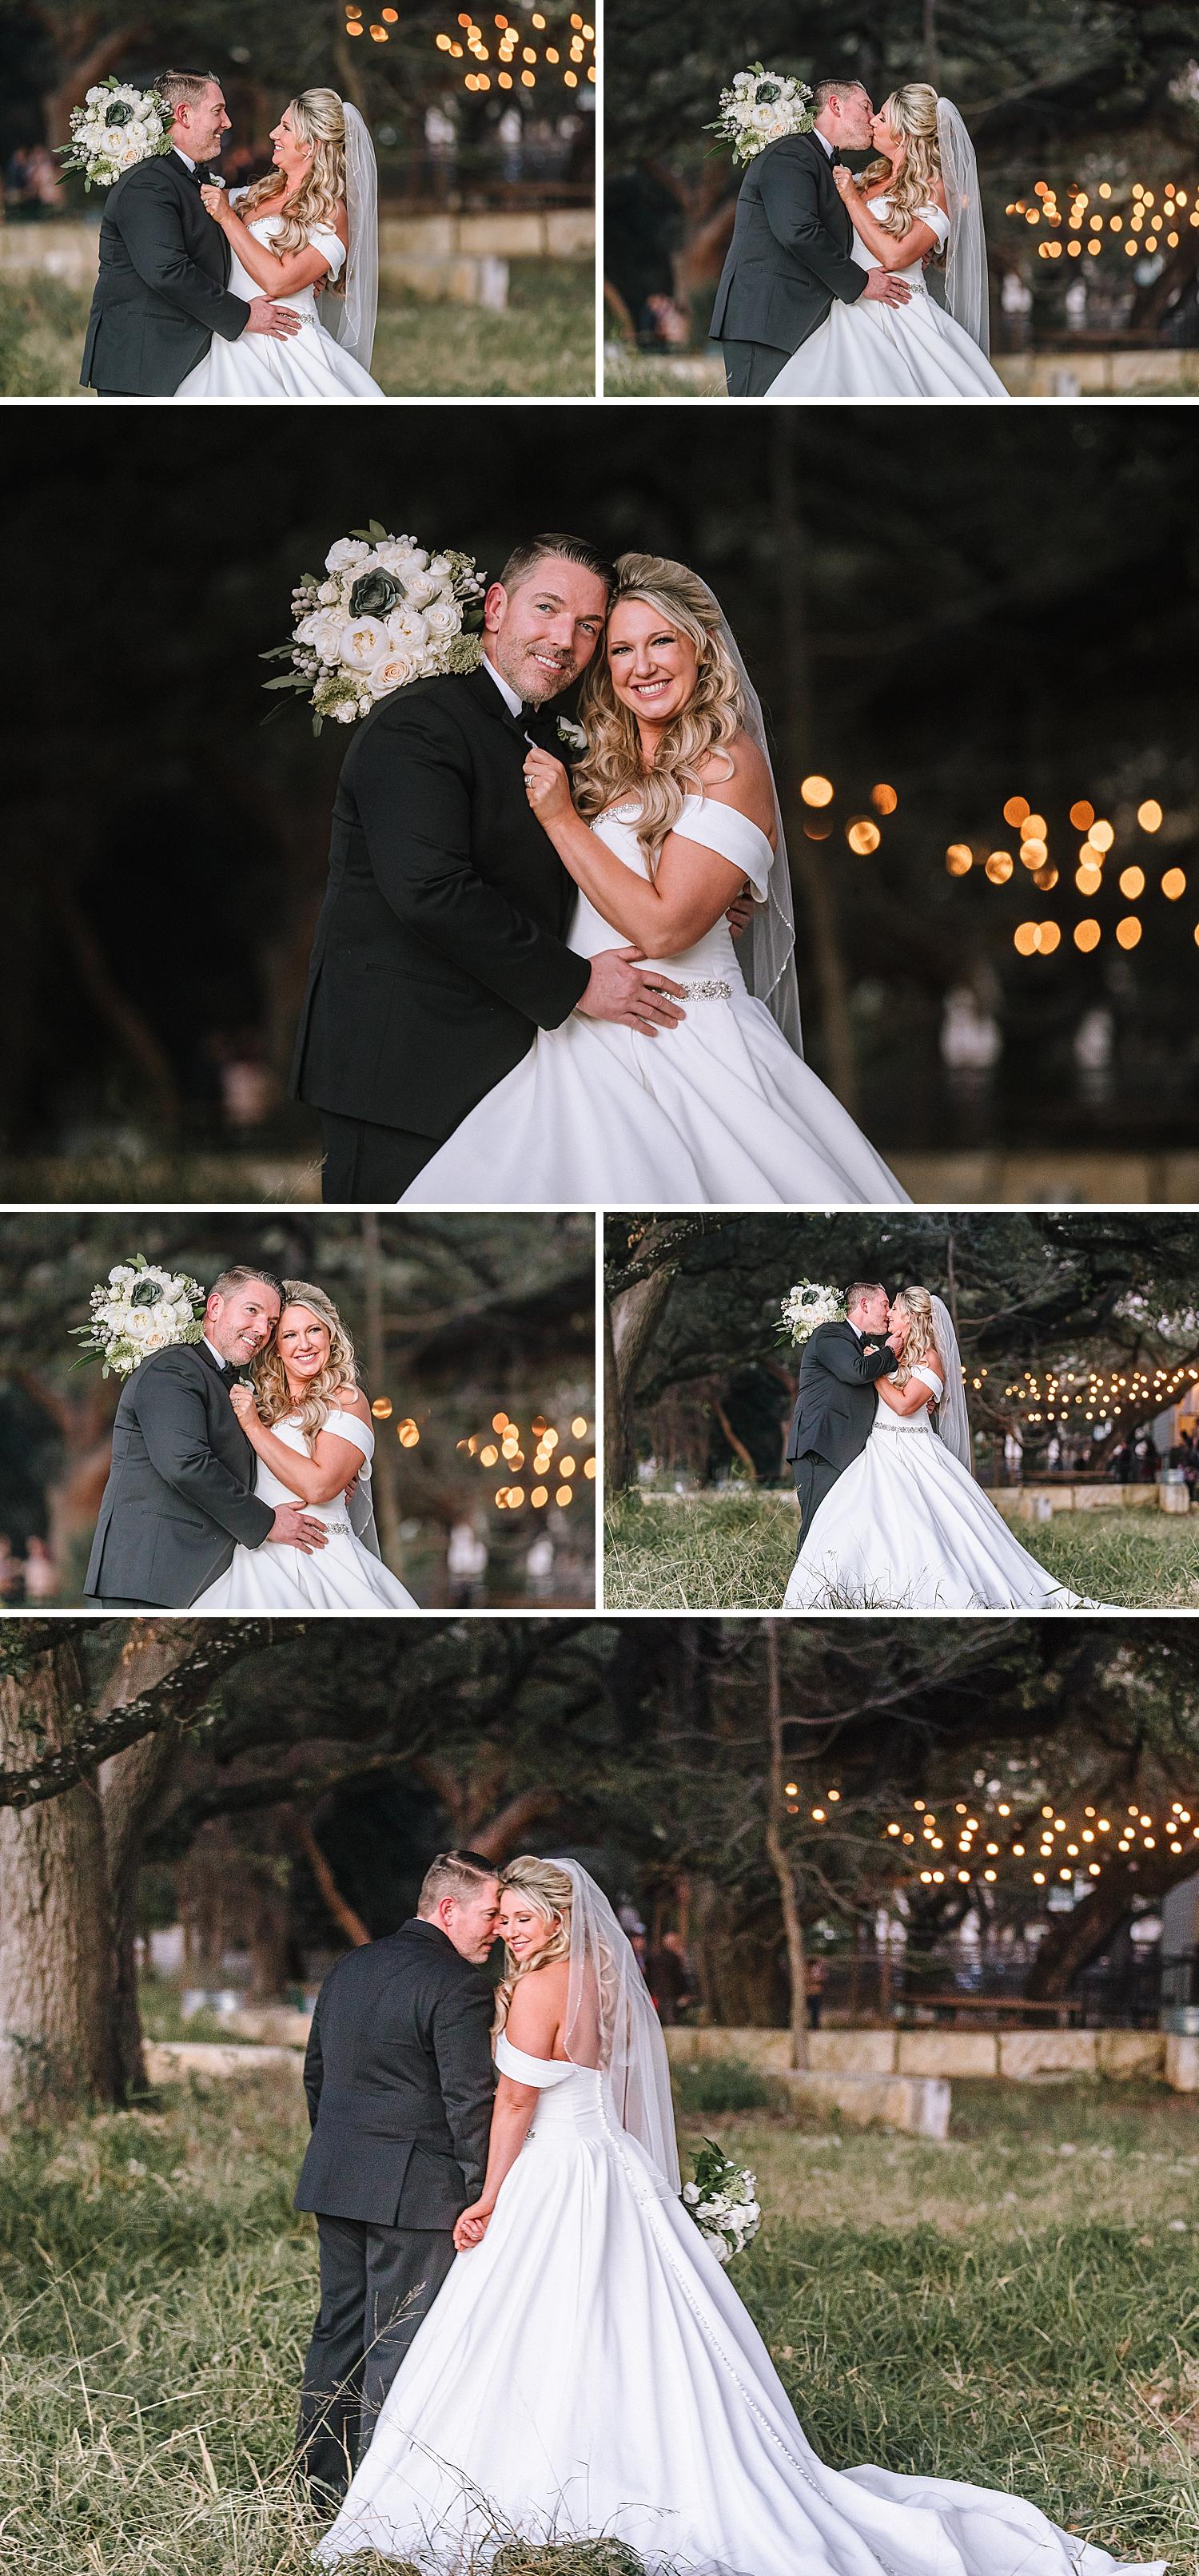 Magnolia-Halle-Wedding-San-Antonio-Texas-Bride-Grom_0070.jpg